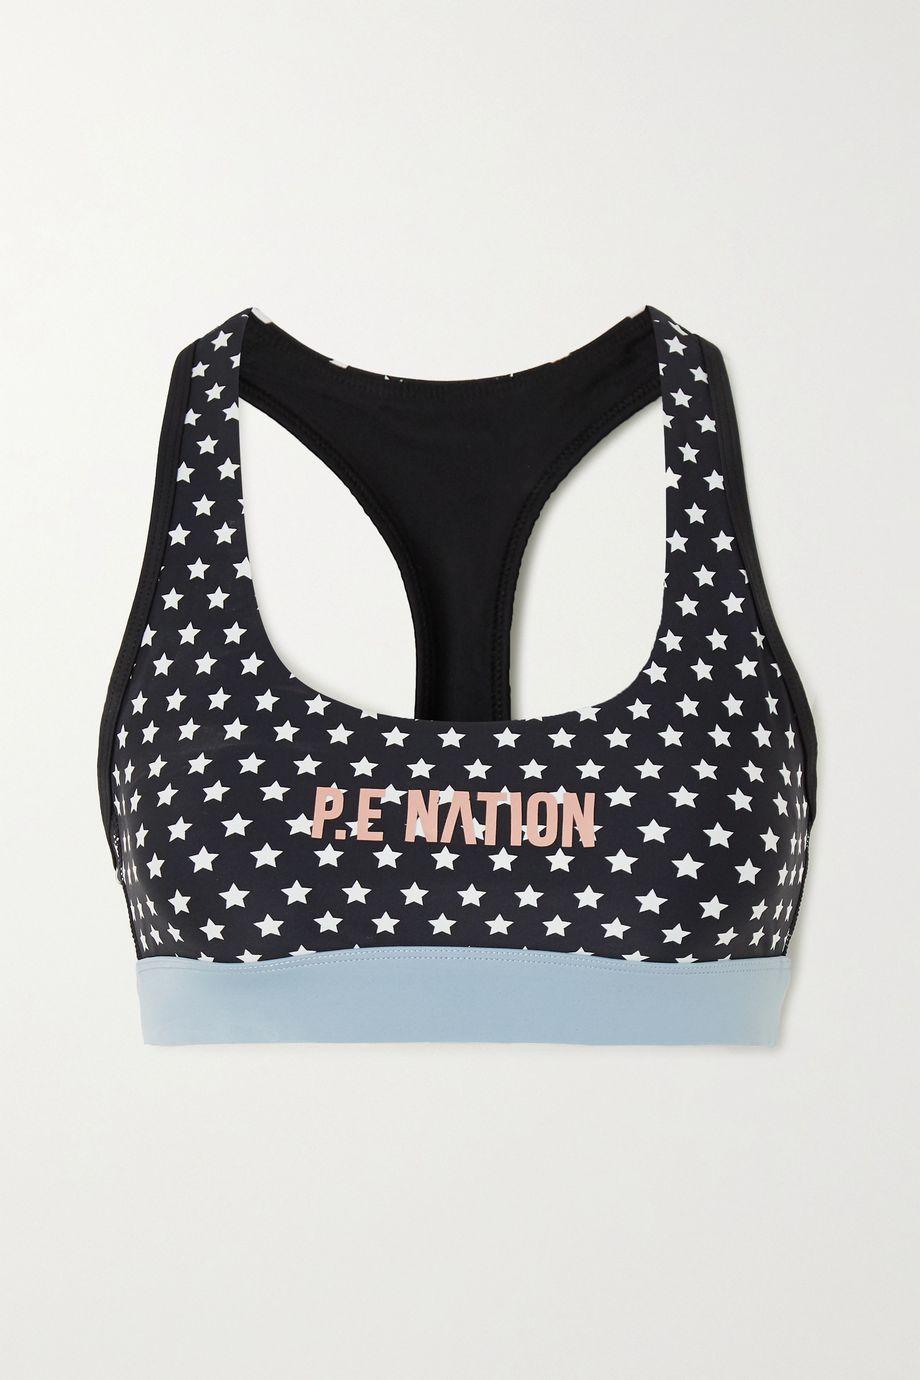 P.E NATION Dominion printed stretch sports bra